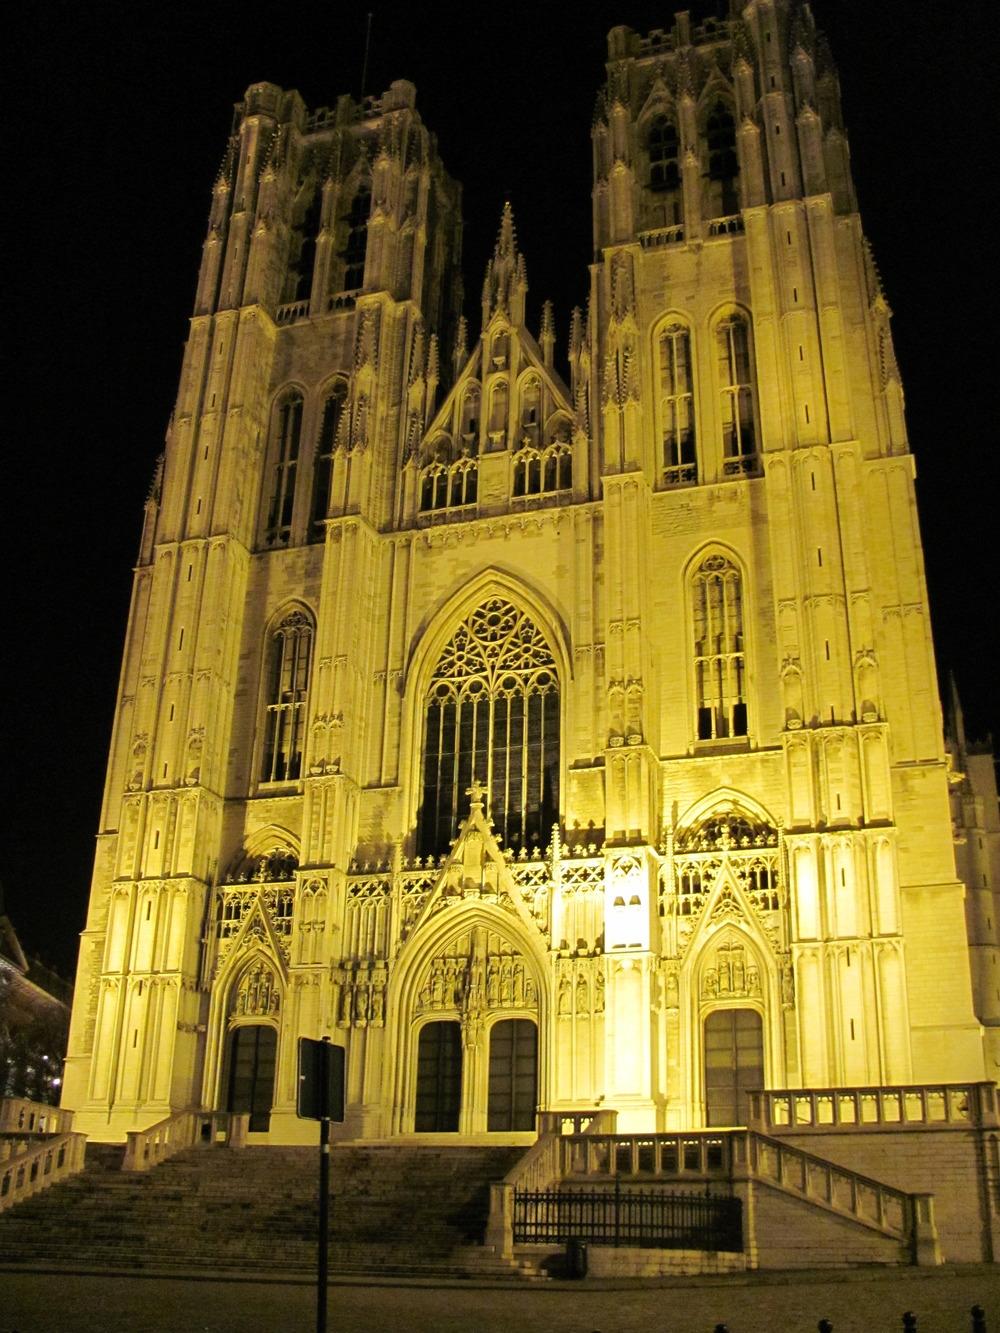 Cathedral des Sint Michielsen Goediekekathedraal, Brussels, Belgium, VHS 2010